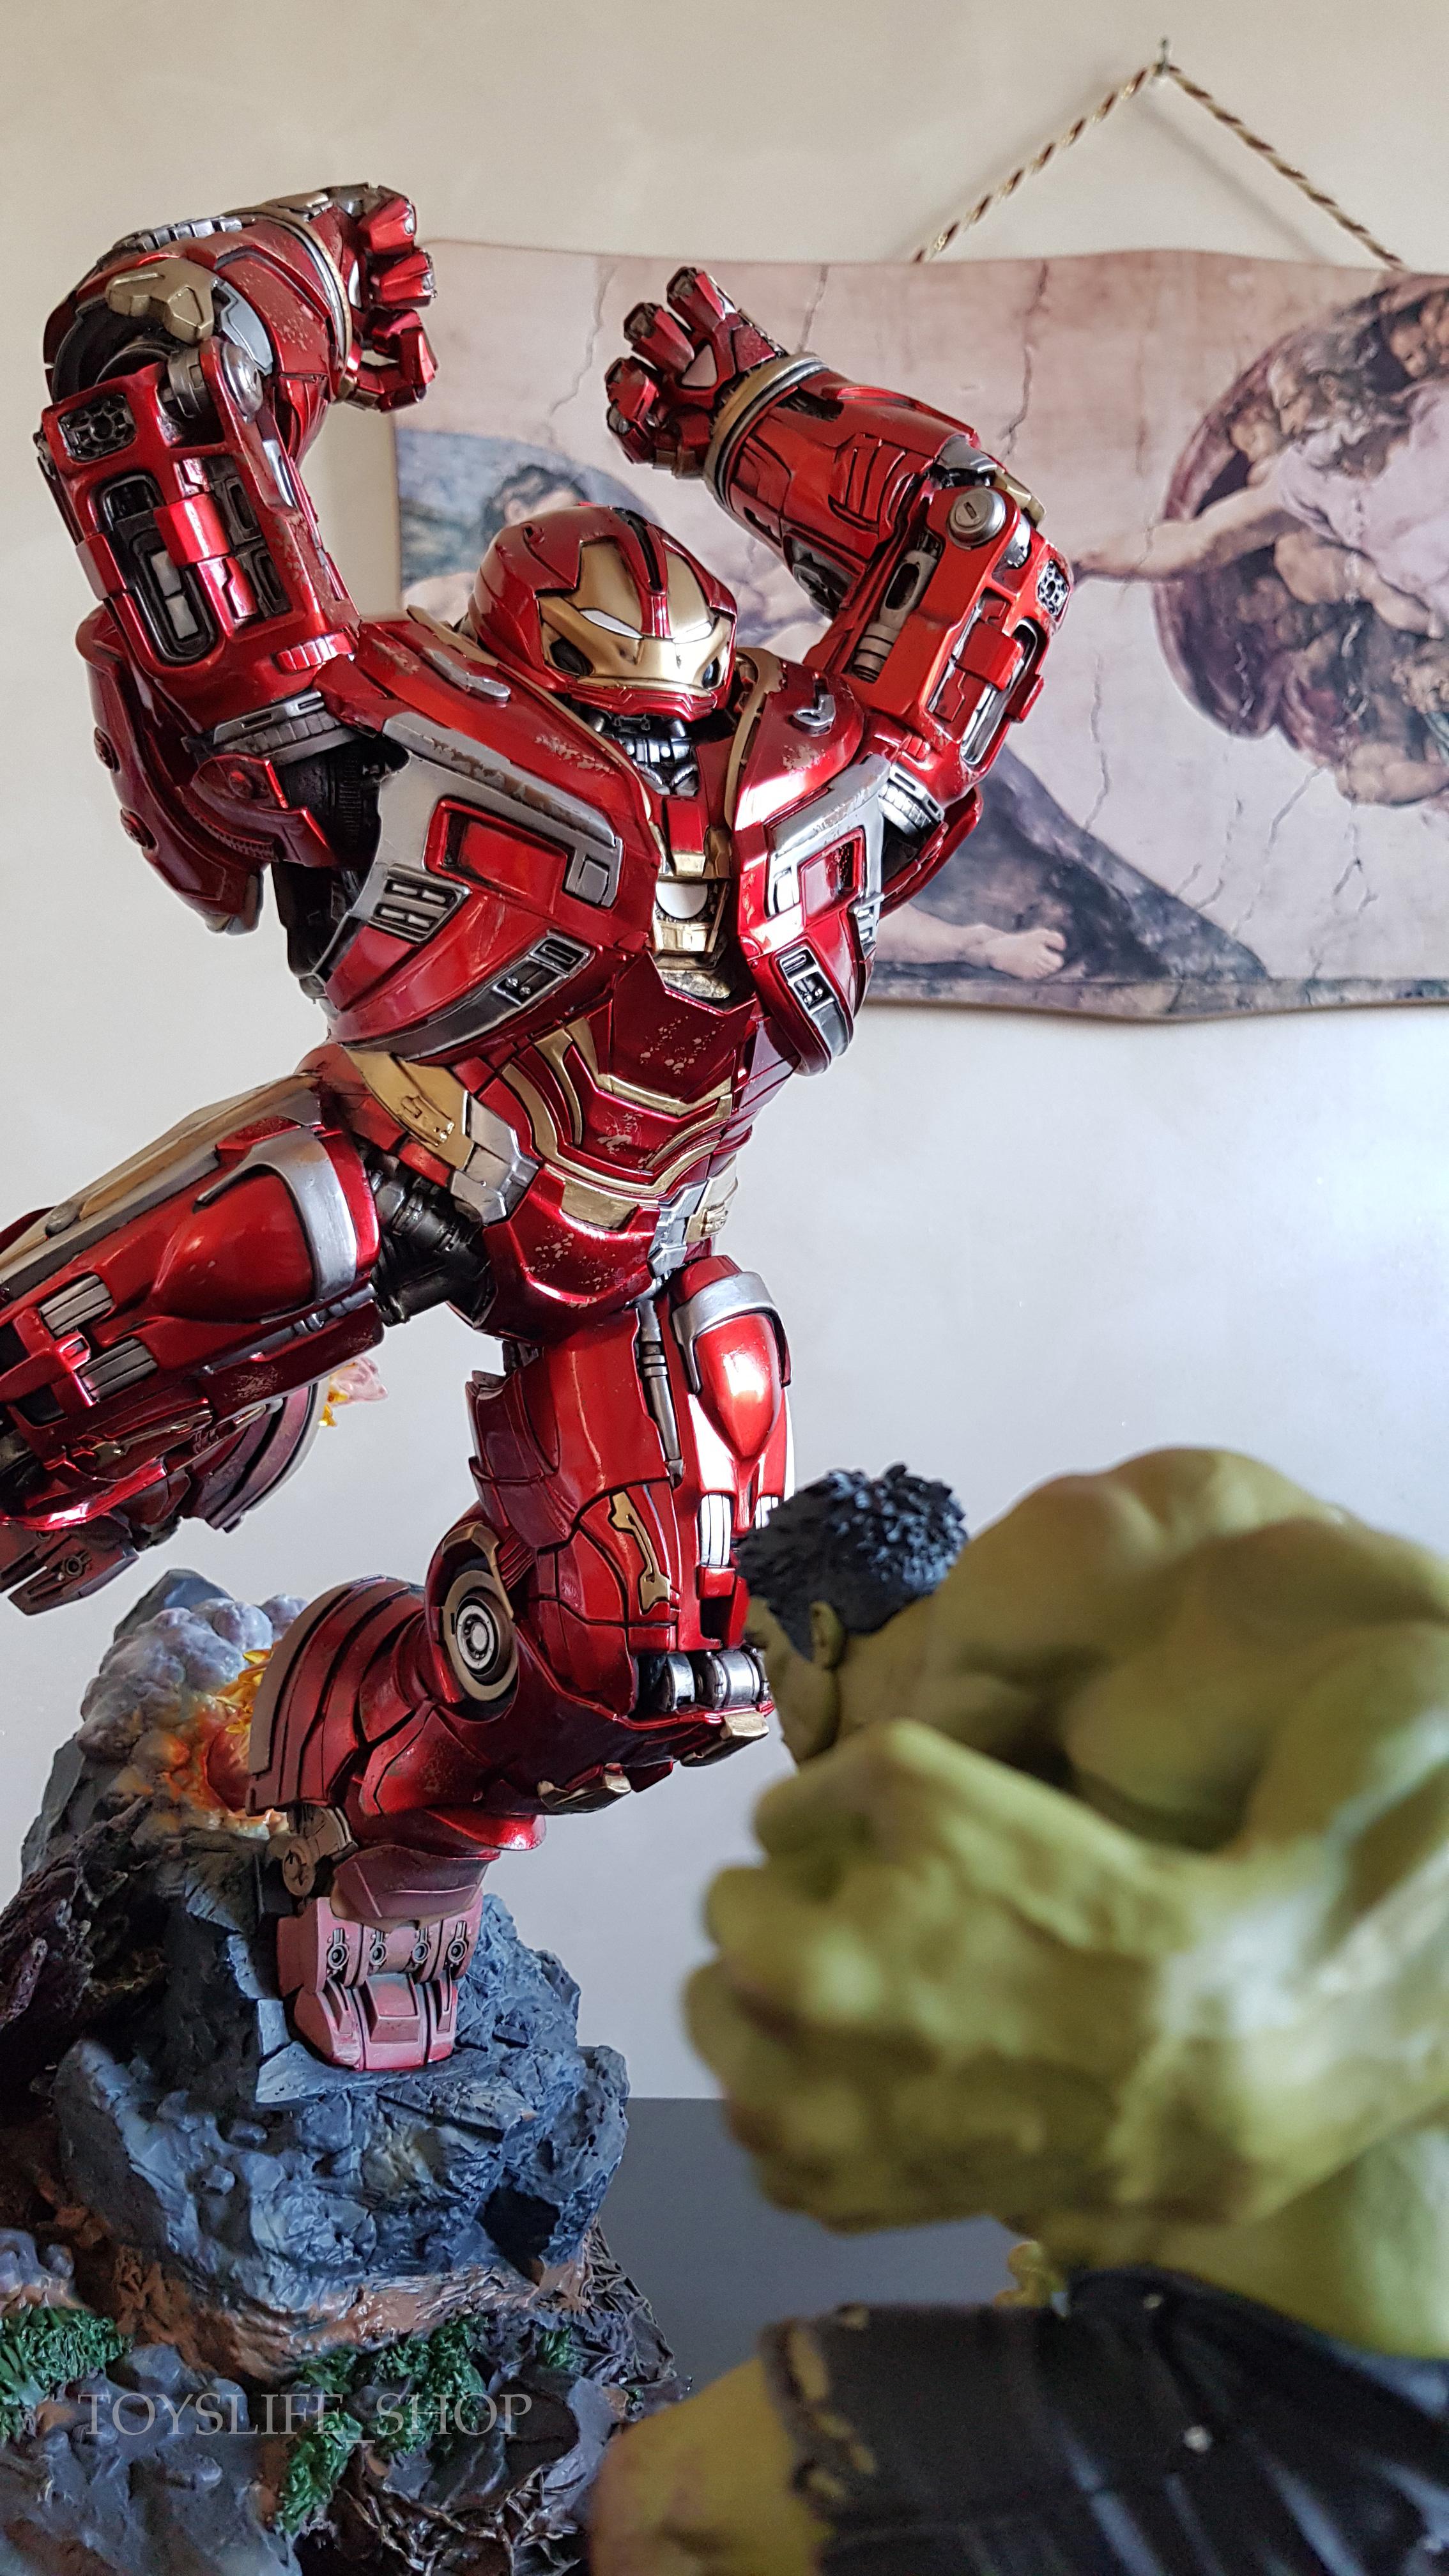 iron-studios-avengers-infinity-war-hulkbuster-1:10-statue-review-toyslife-14